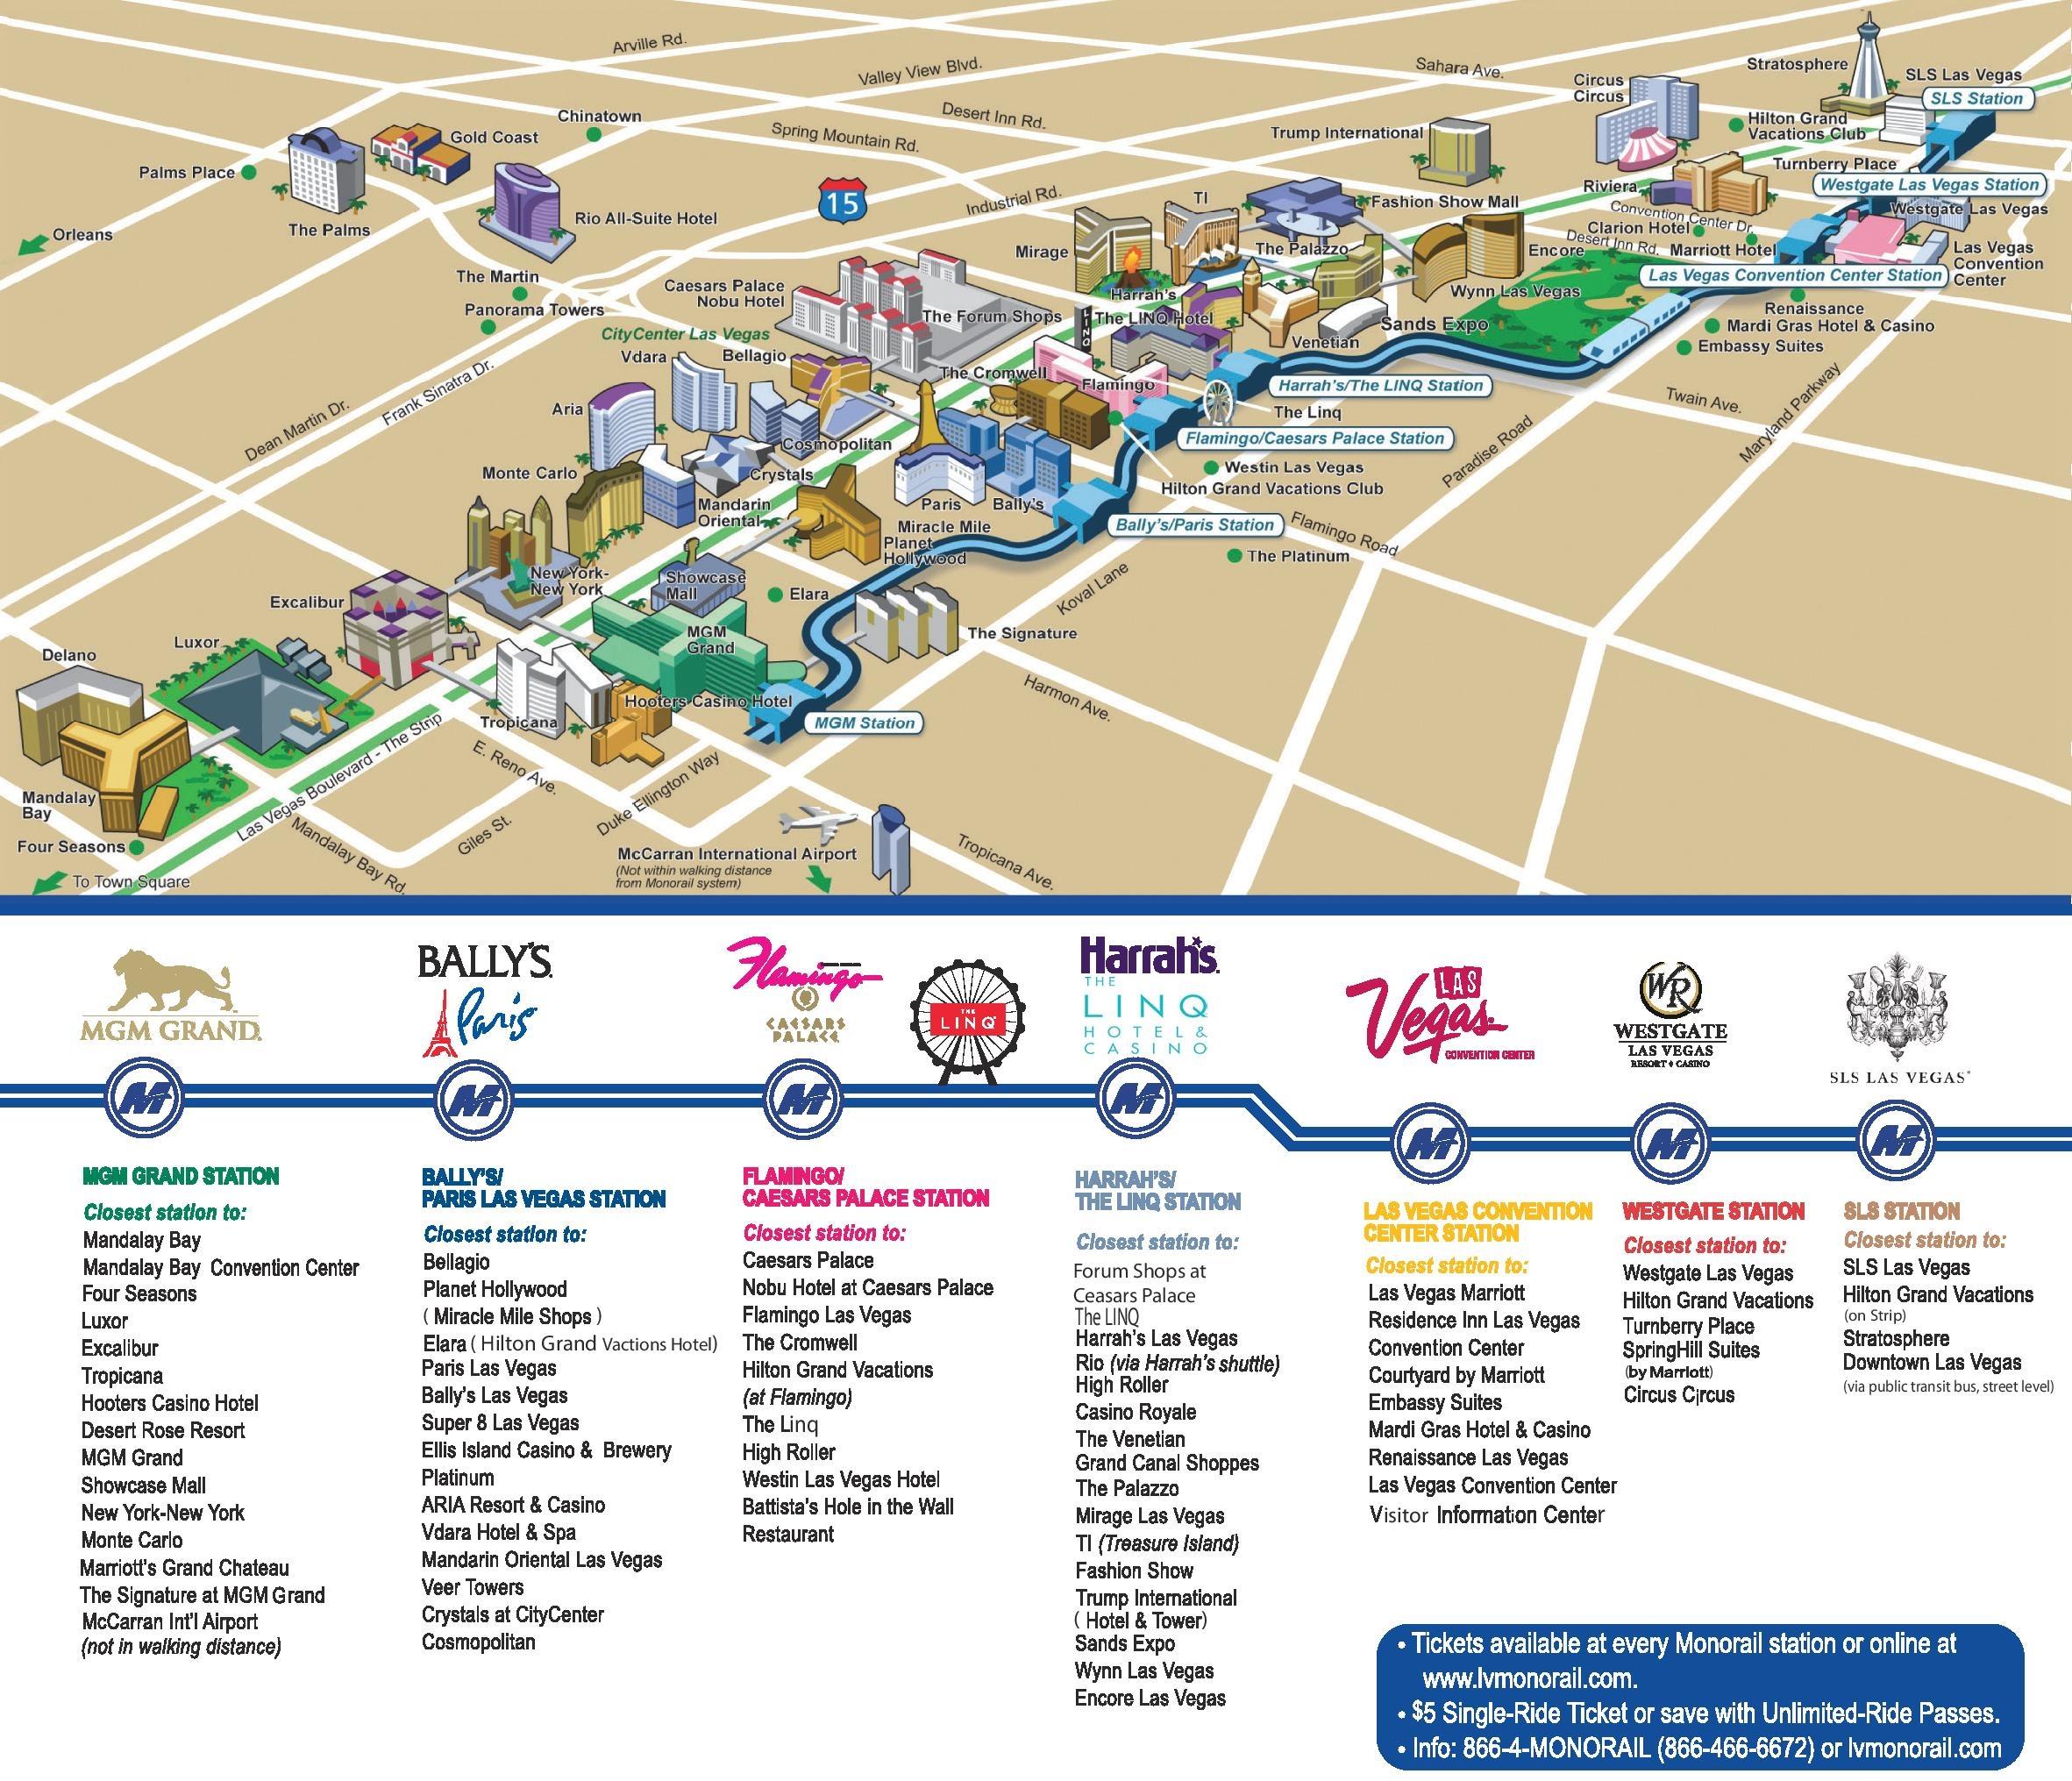 Printable Map Las Vegas Strip | Download Them Or Print - Printable Las Vegas Strip Map 2017